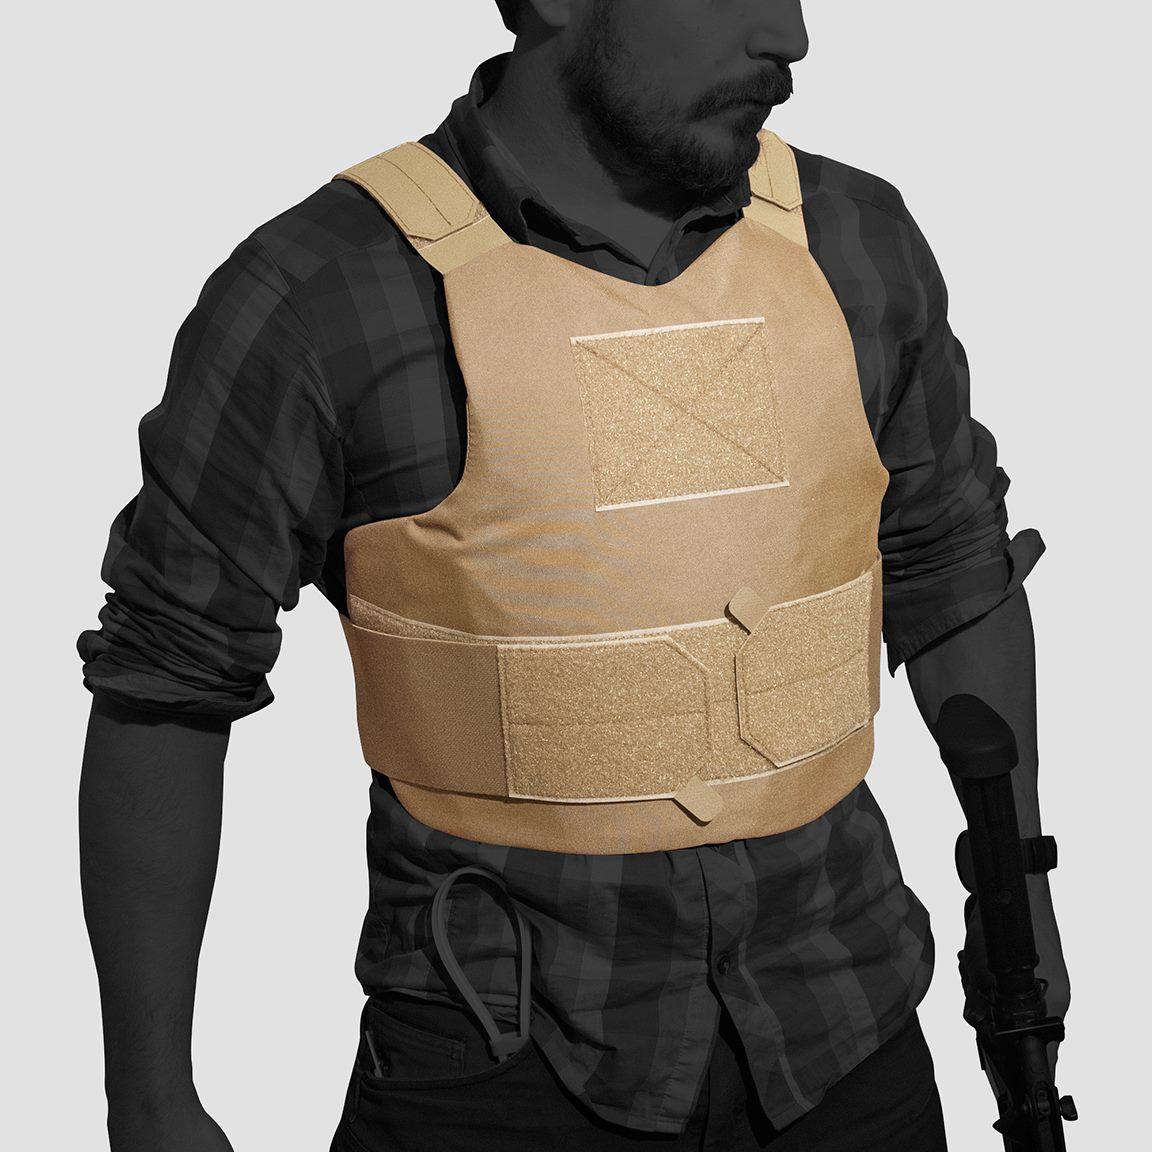 body armor - 602×602